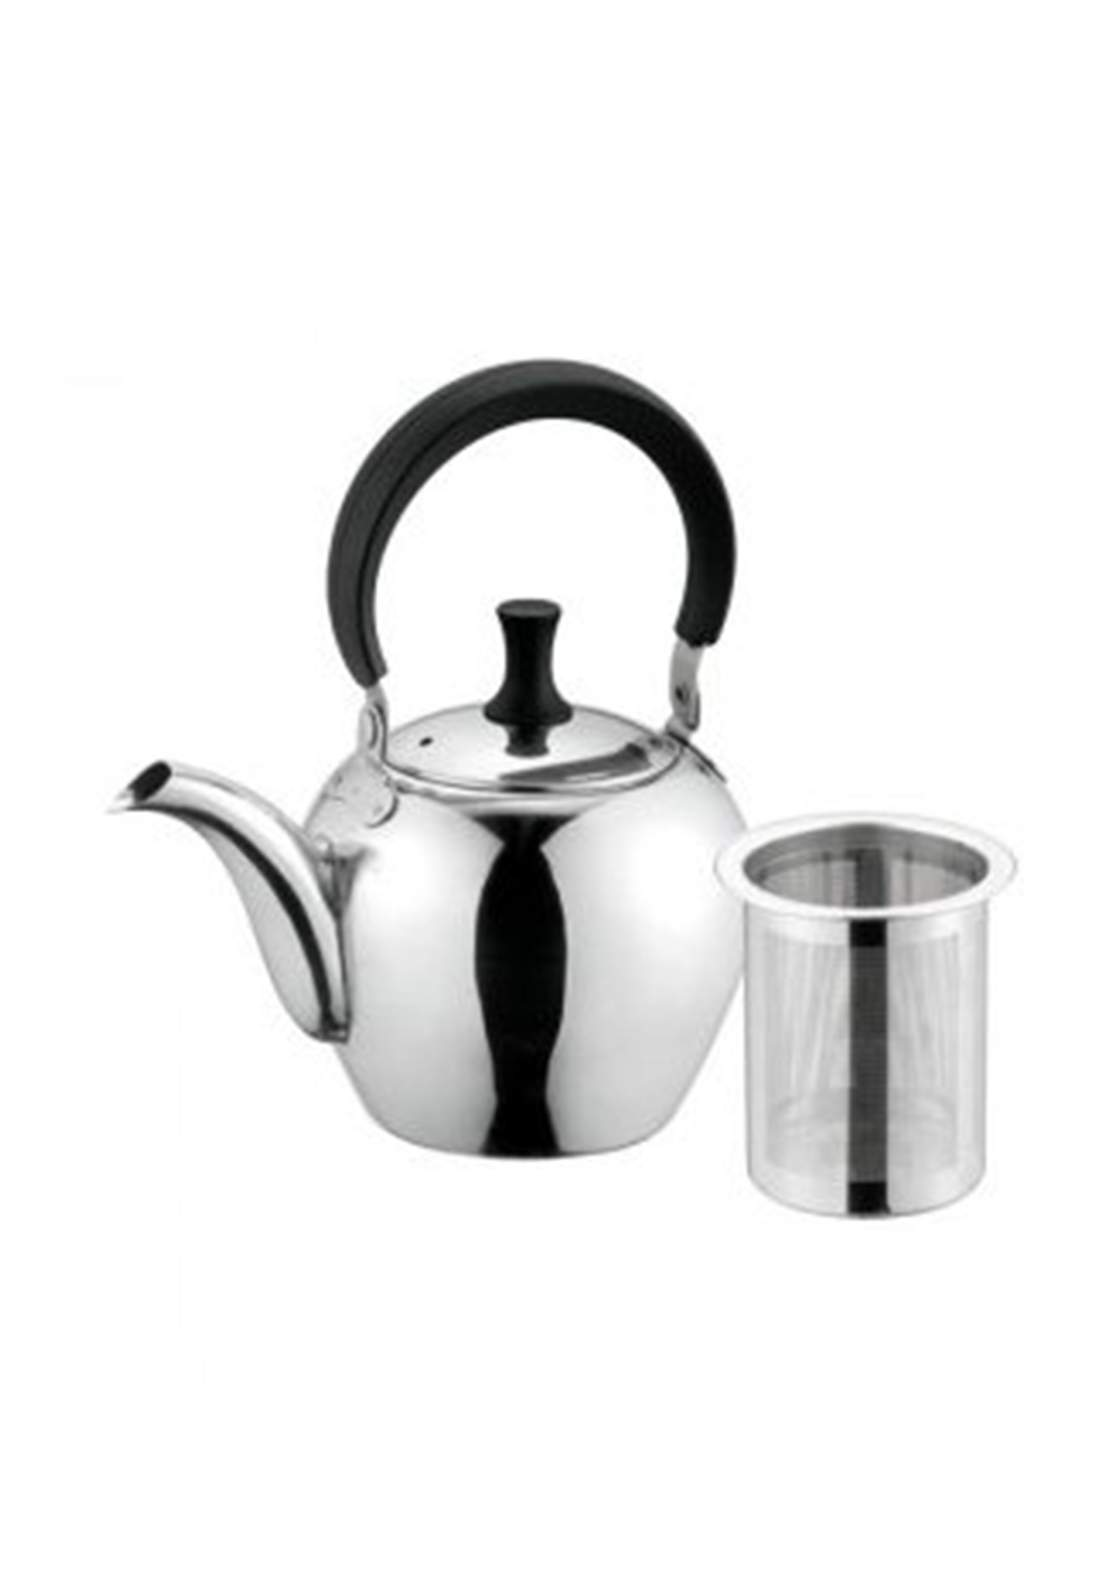 ابريق شاي من بيرل ميتال 600مل